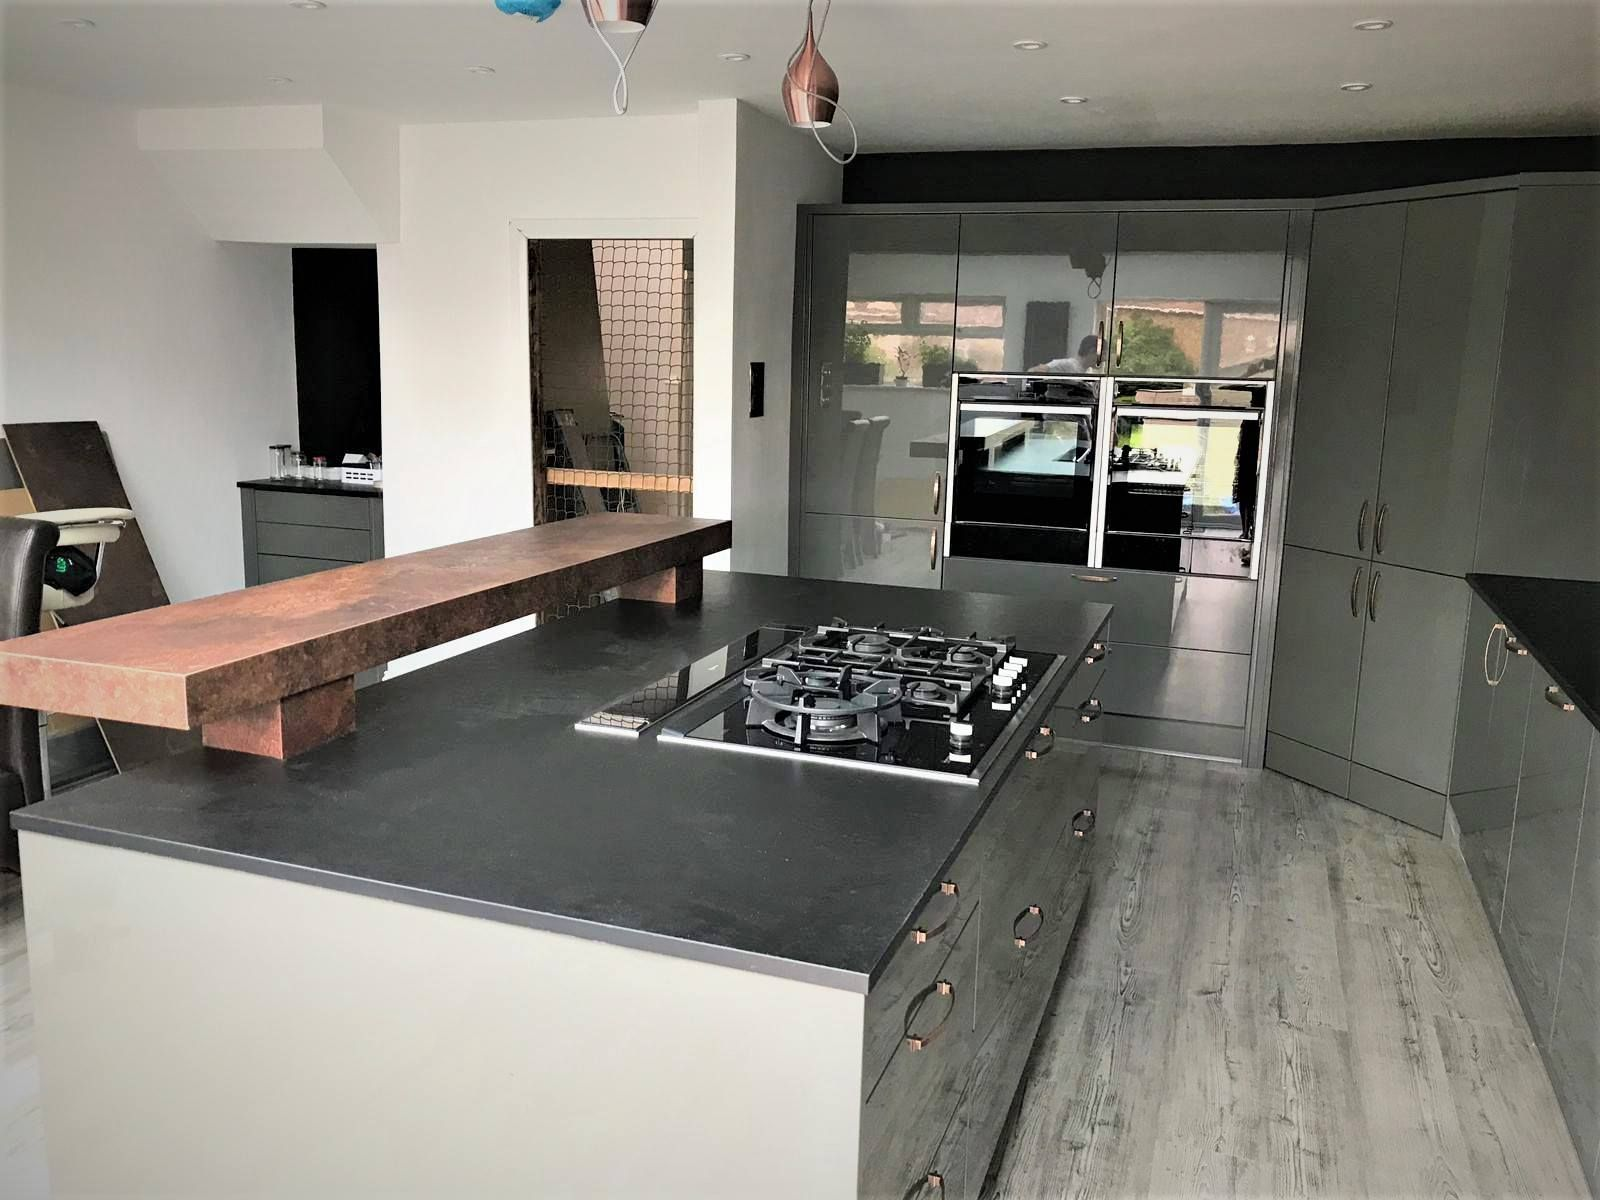 5 Burner Gas Hob Inside Breakfast Bar Breakfast Bar Freestanding Kitchen Island Stools For Kitchen Island